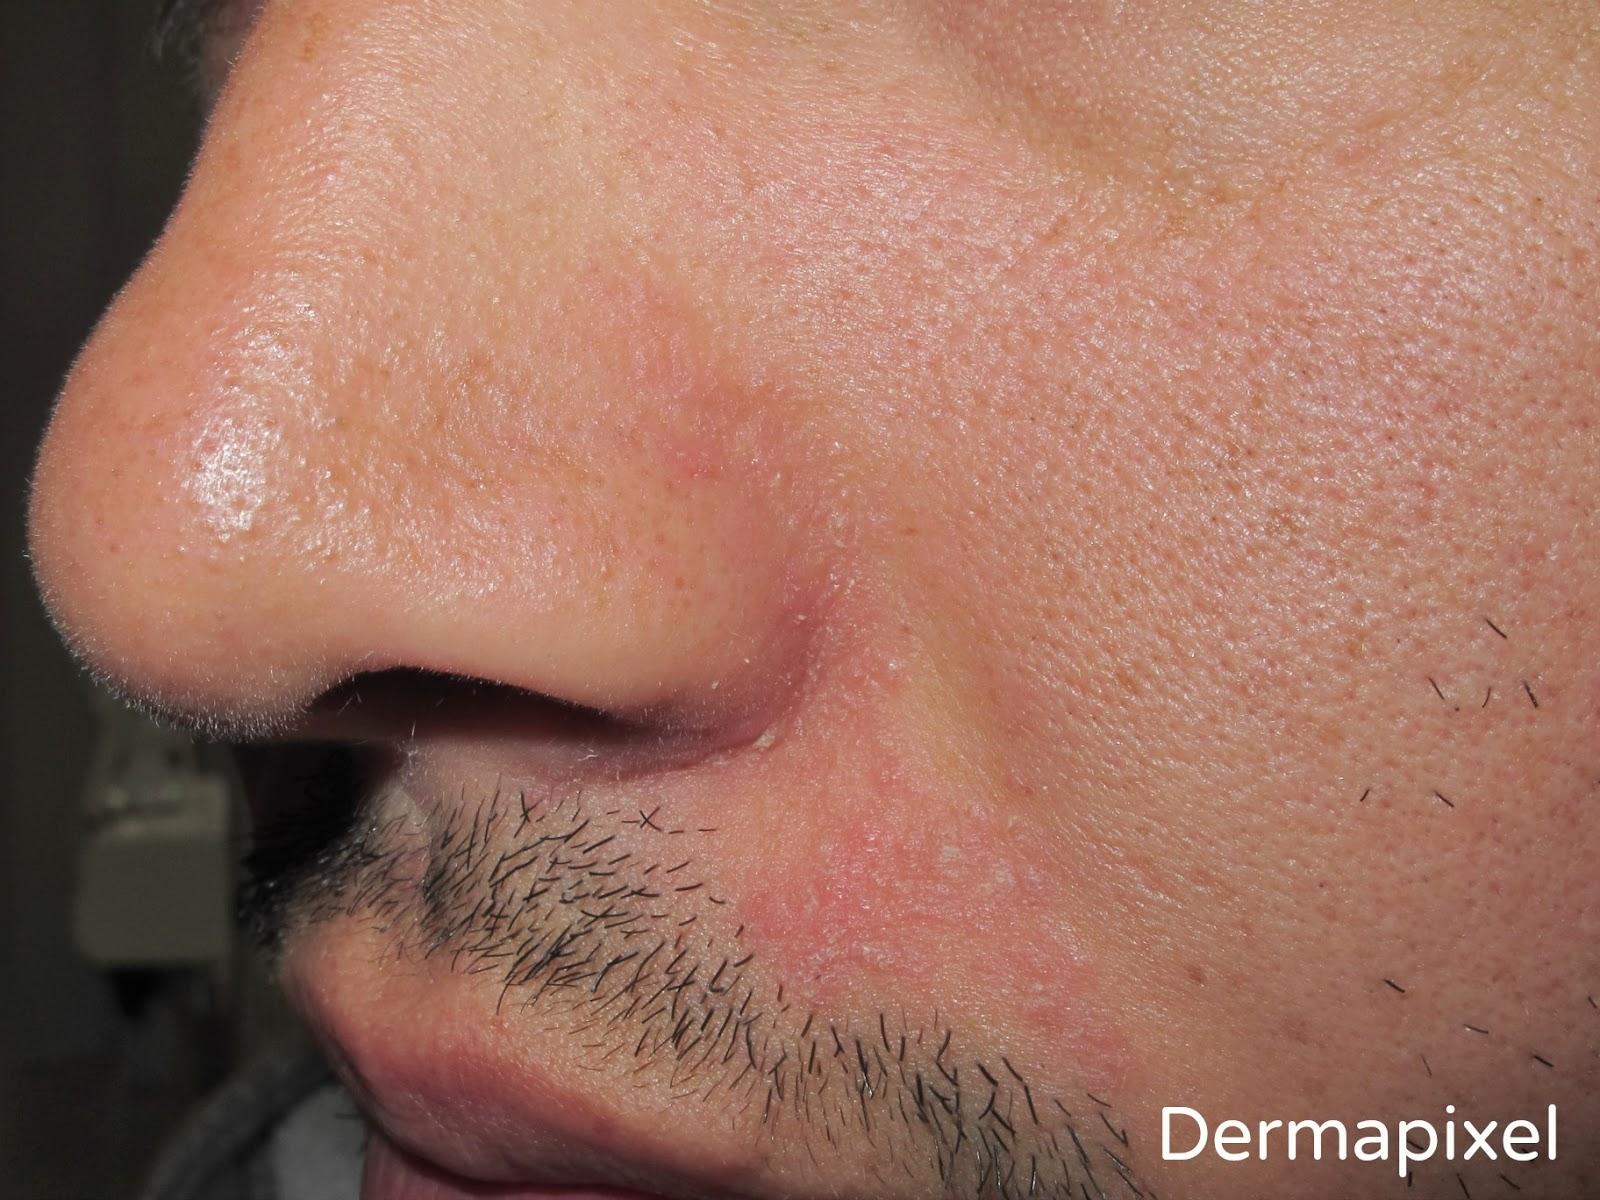 Atopichesky la dermatitis de la parte pilosa de la cabeza